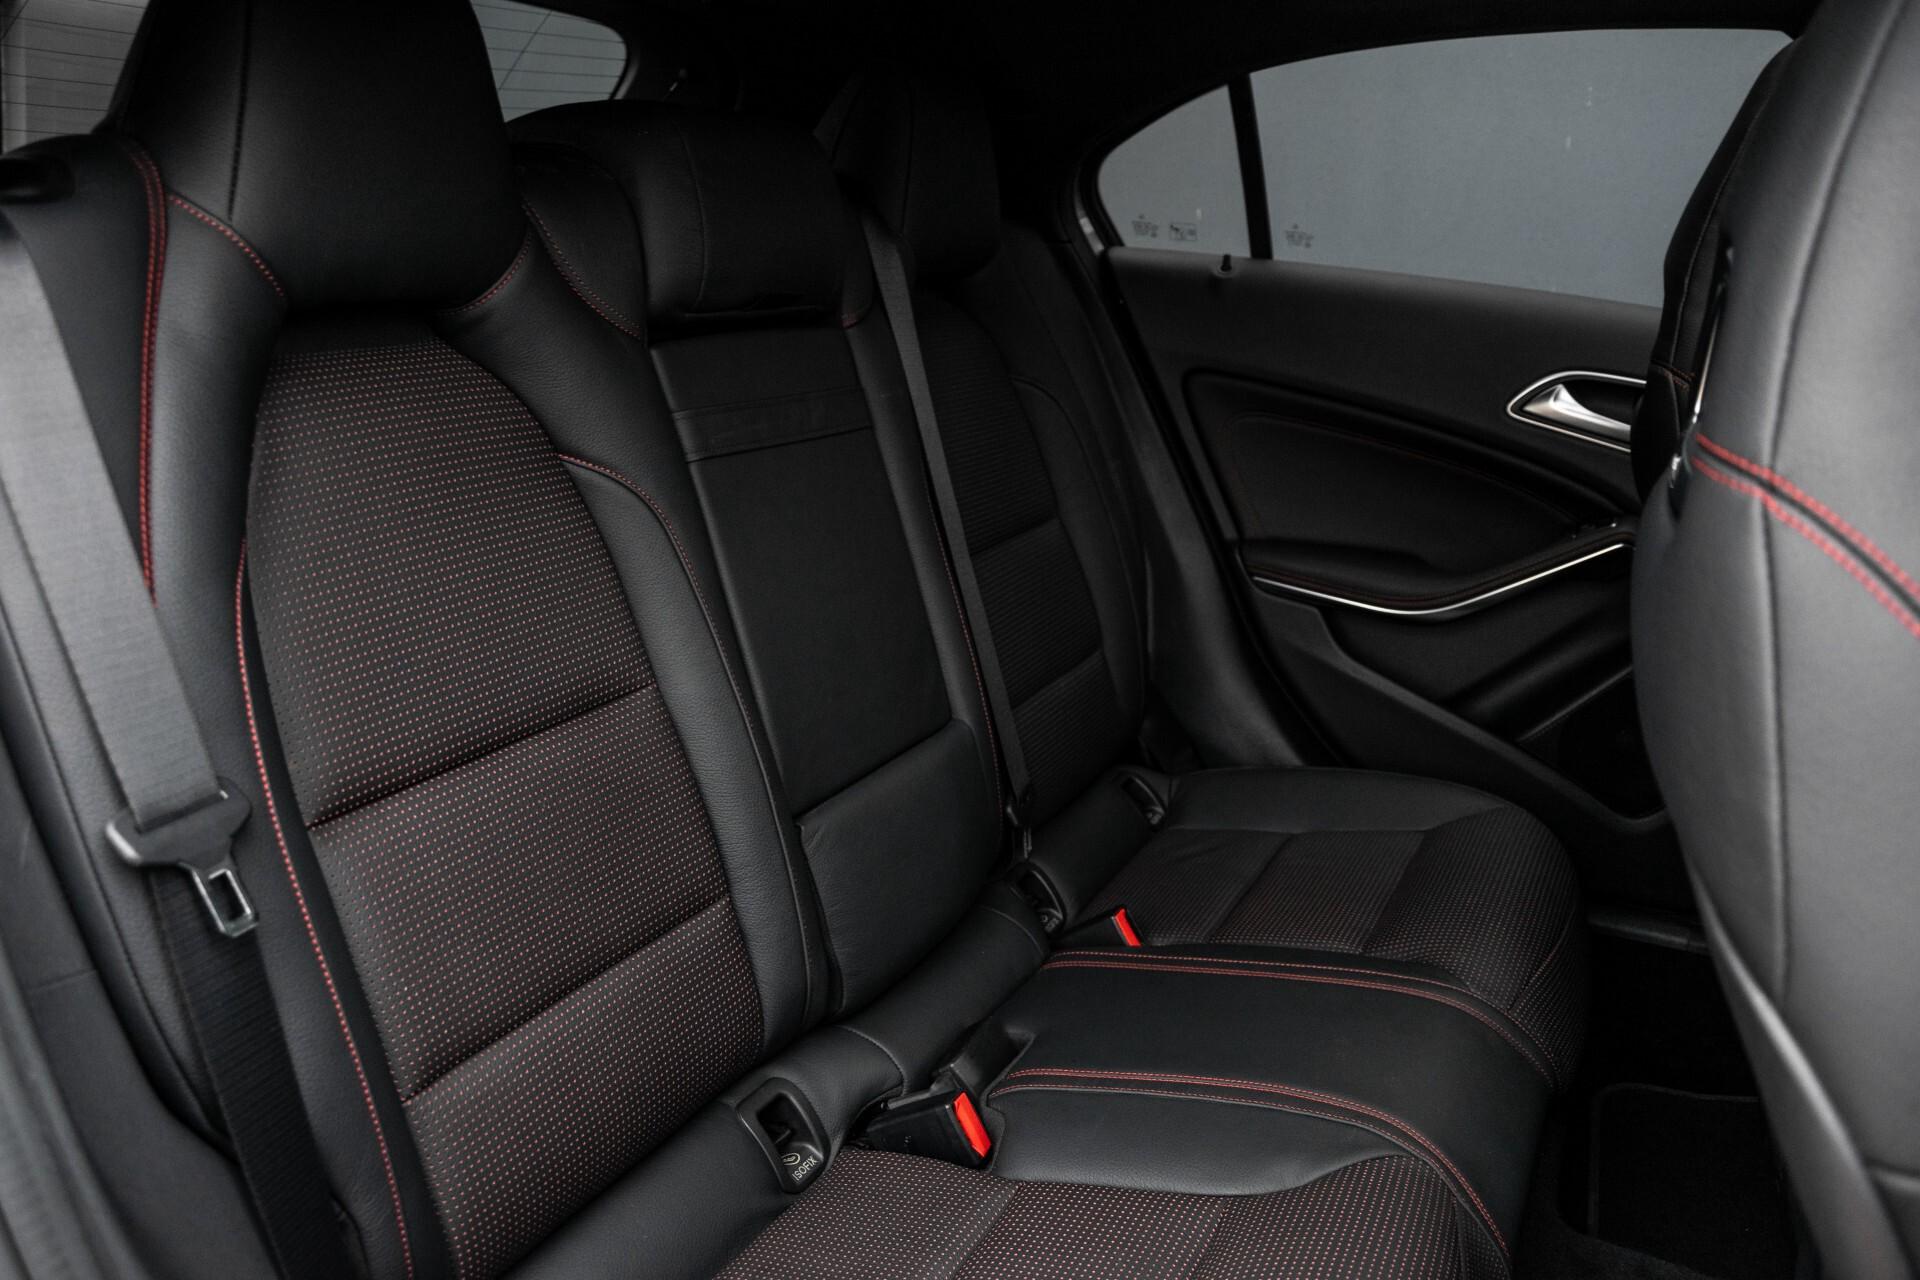 Mercedes-Benz A-Klasse 250 Sport AMG Panorama/Standkachel/Mem/Harman-Kardon/Distronic/Camera/Com Aut7 Foto 5